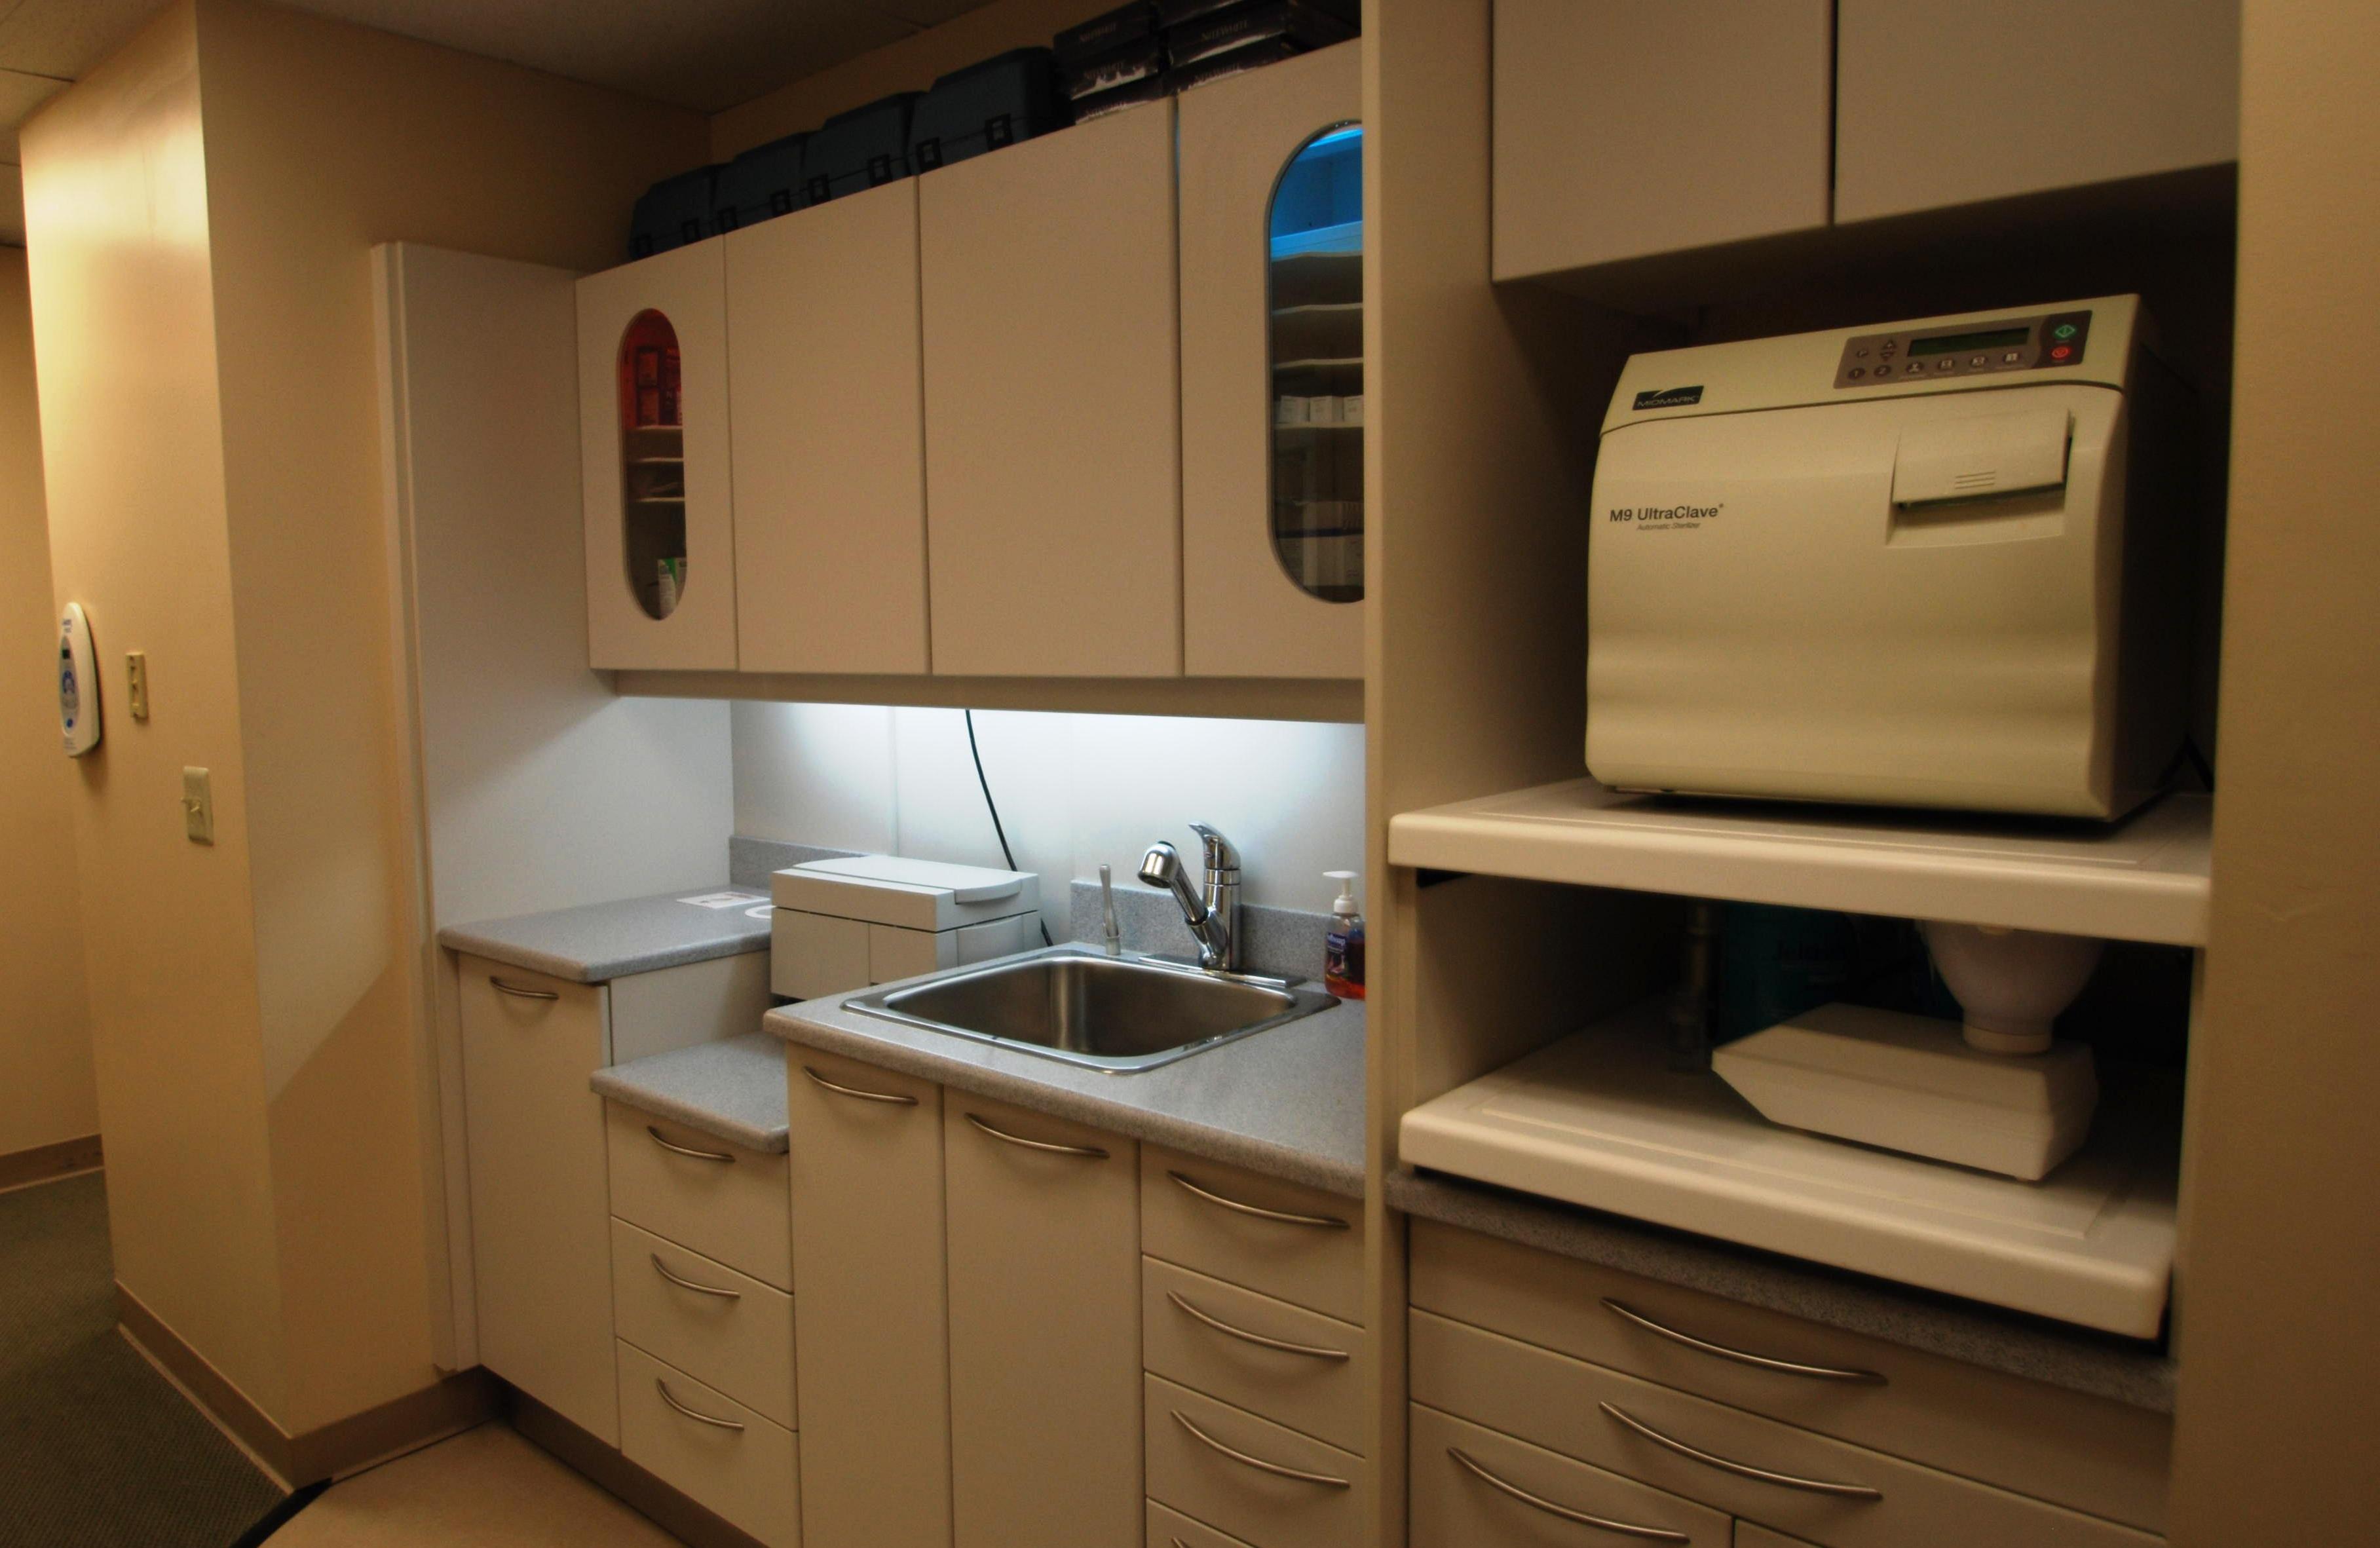 sterilization_center.jpg